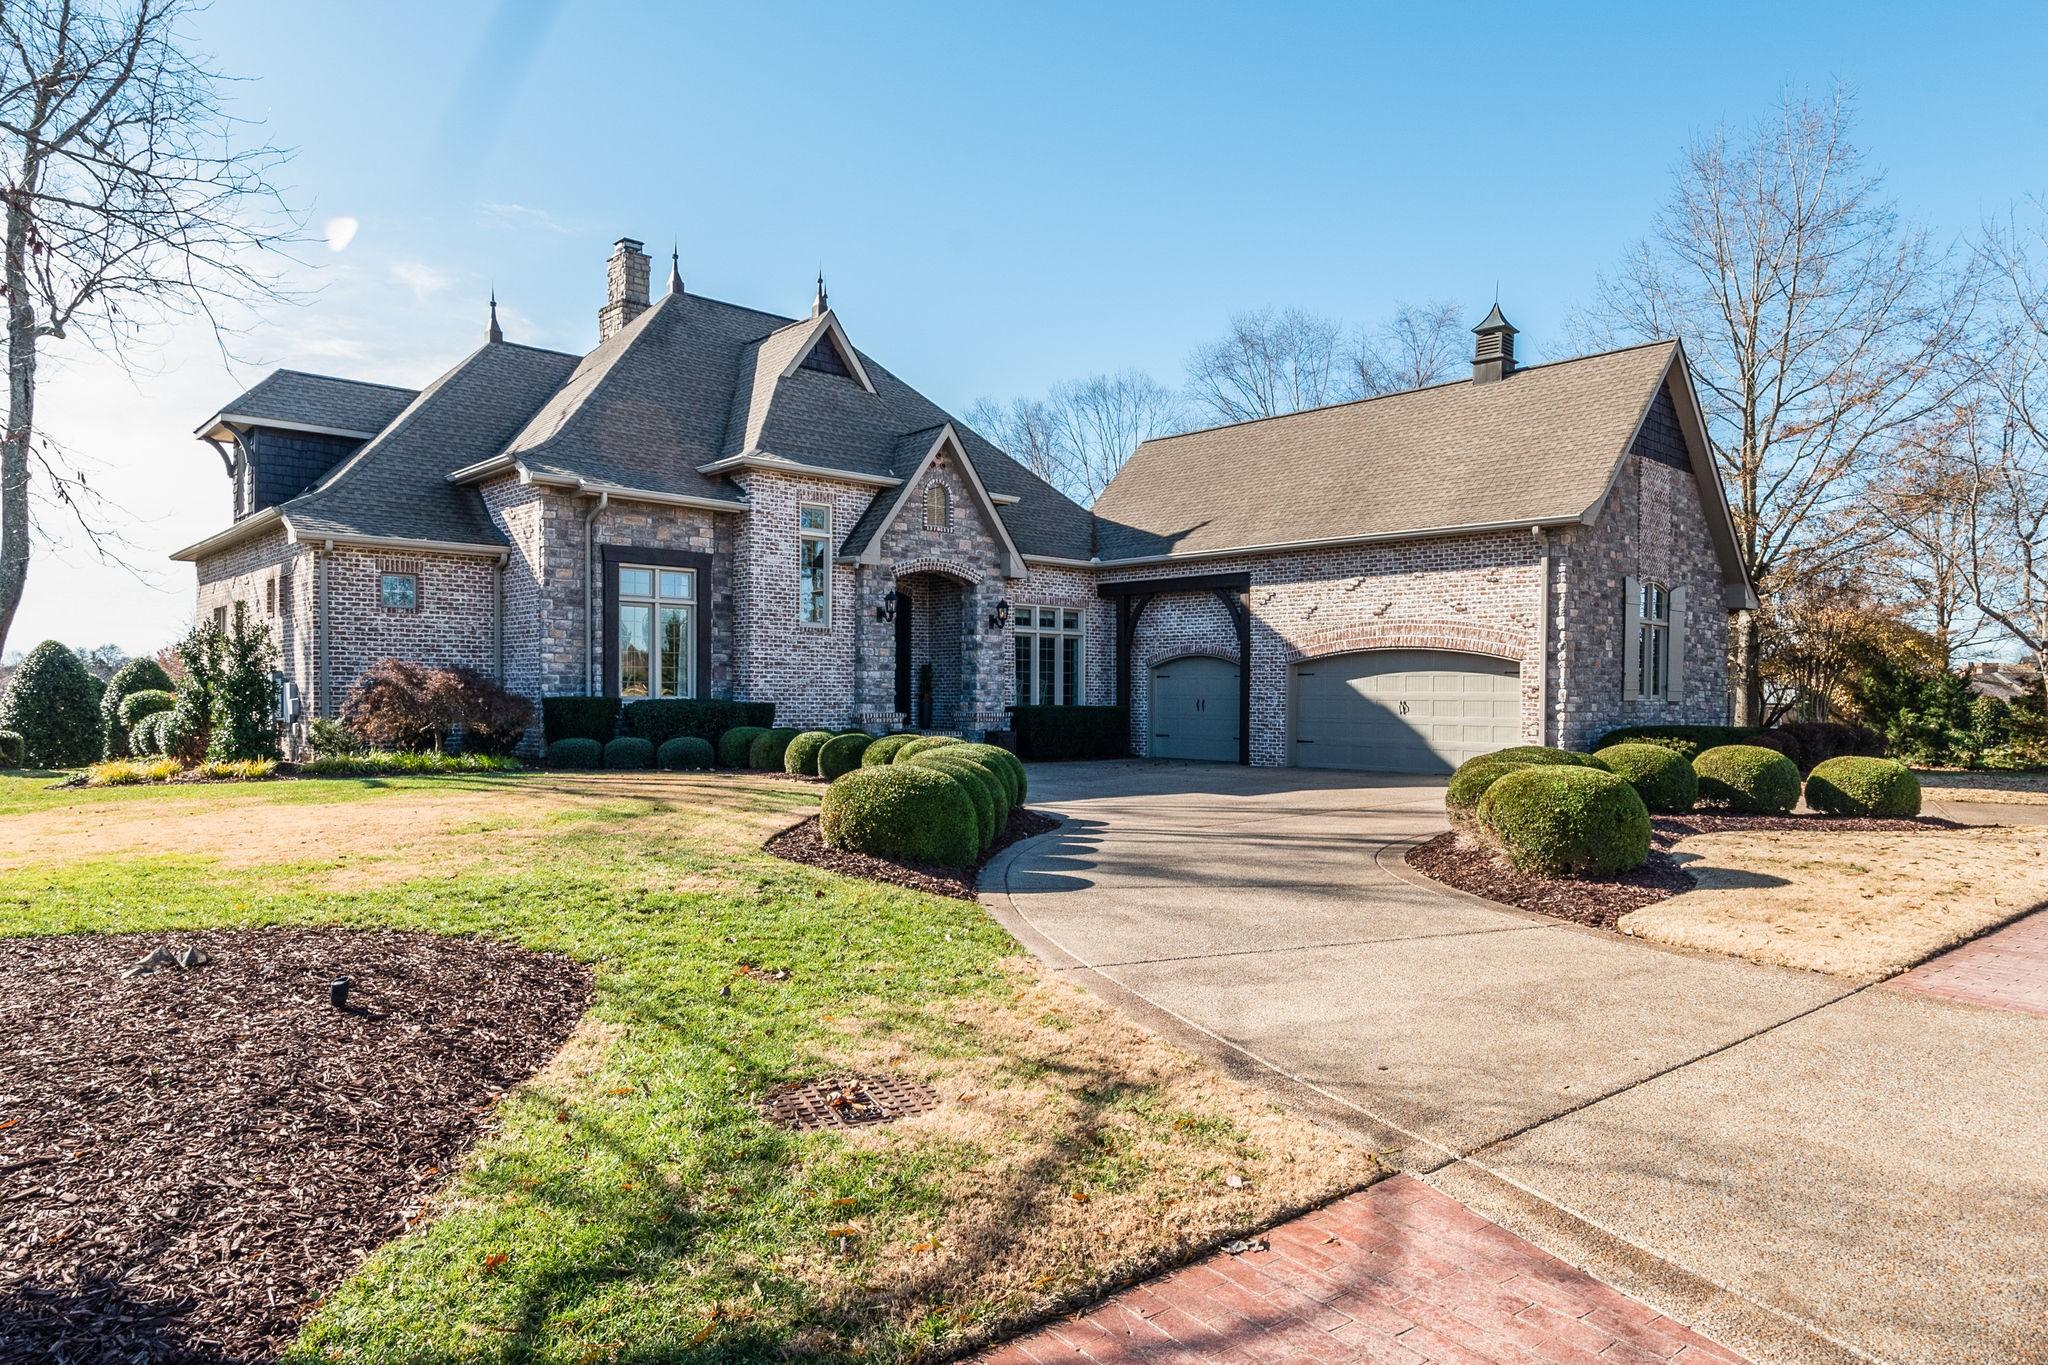 961 Plantation Blvd, Gallatin, TN 37066 - Gallatin, TN real estate listing